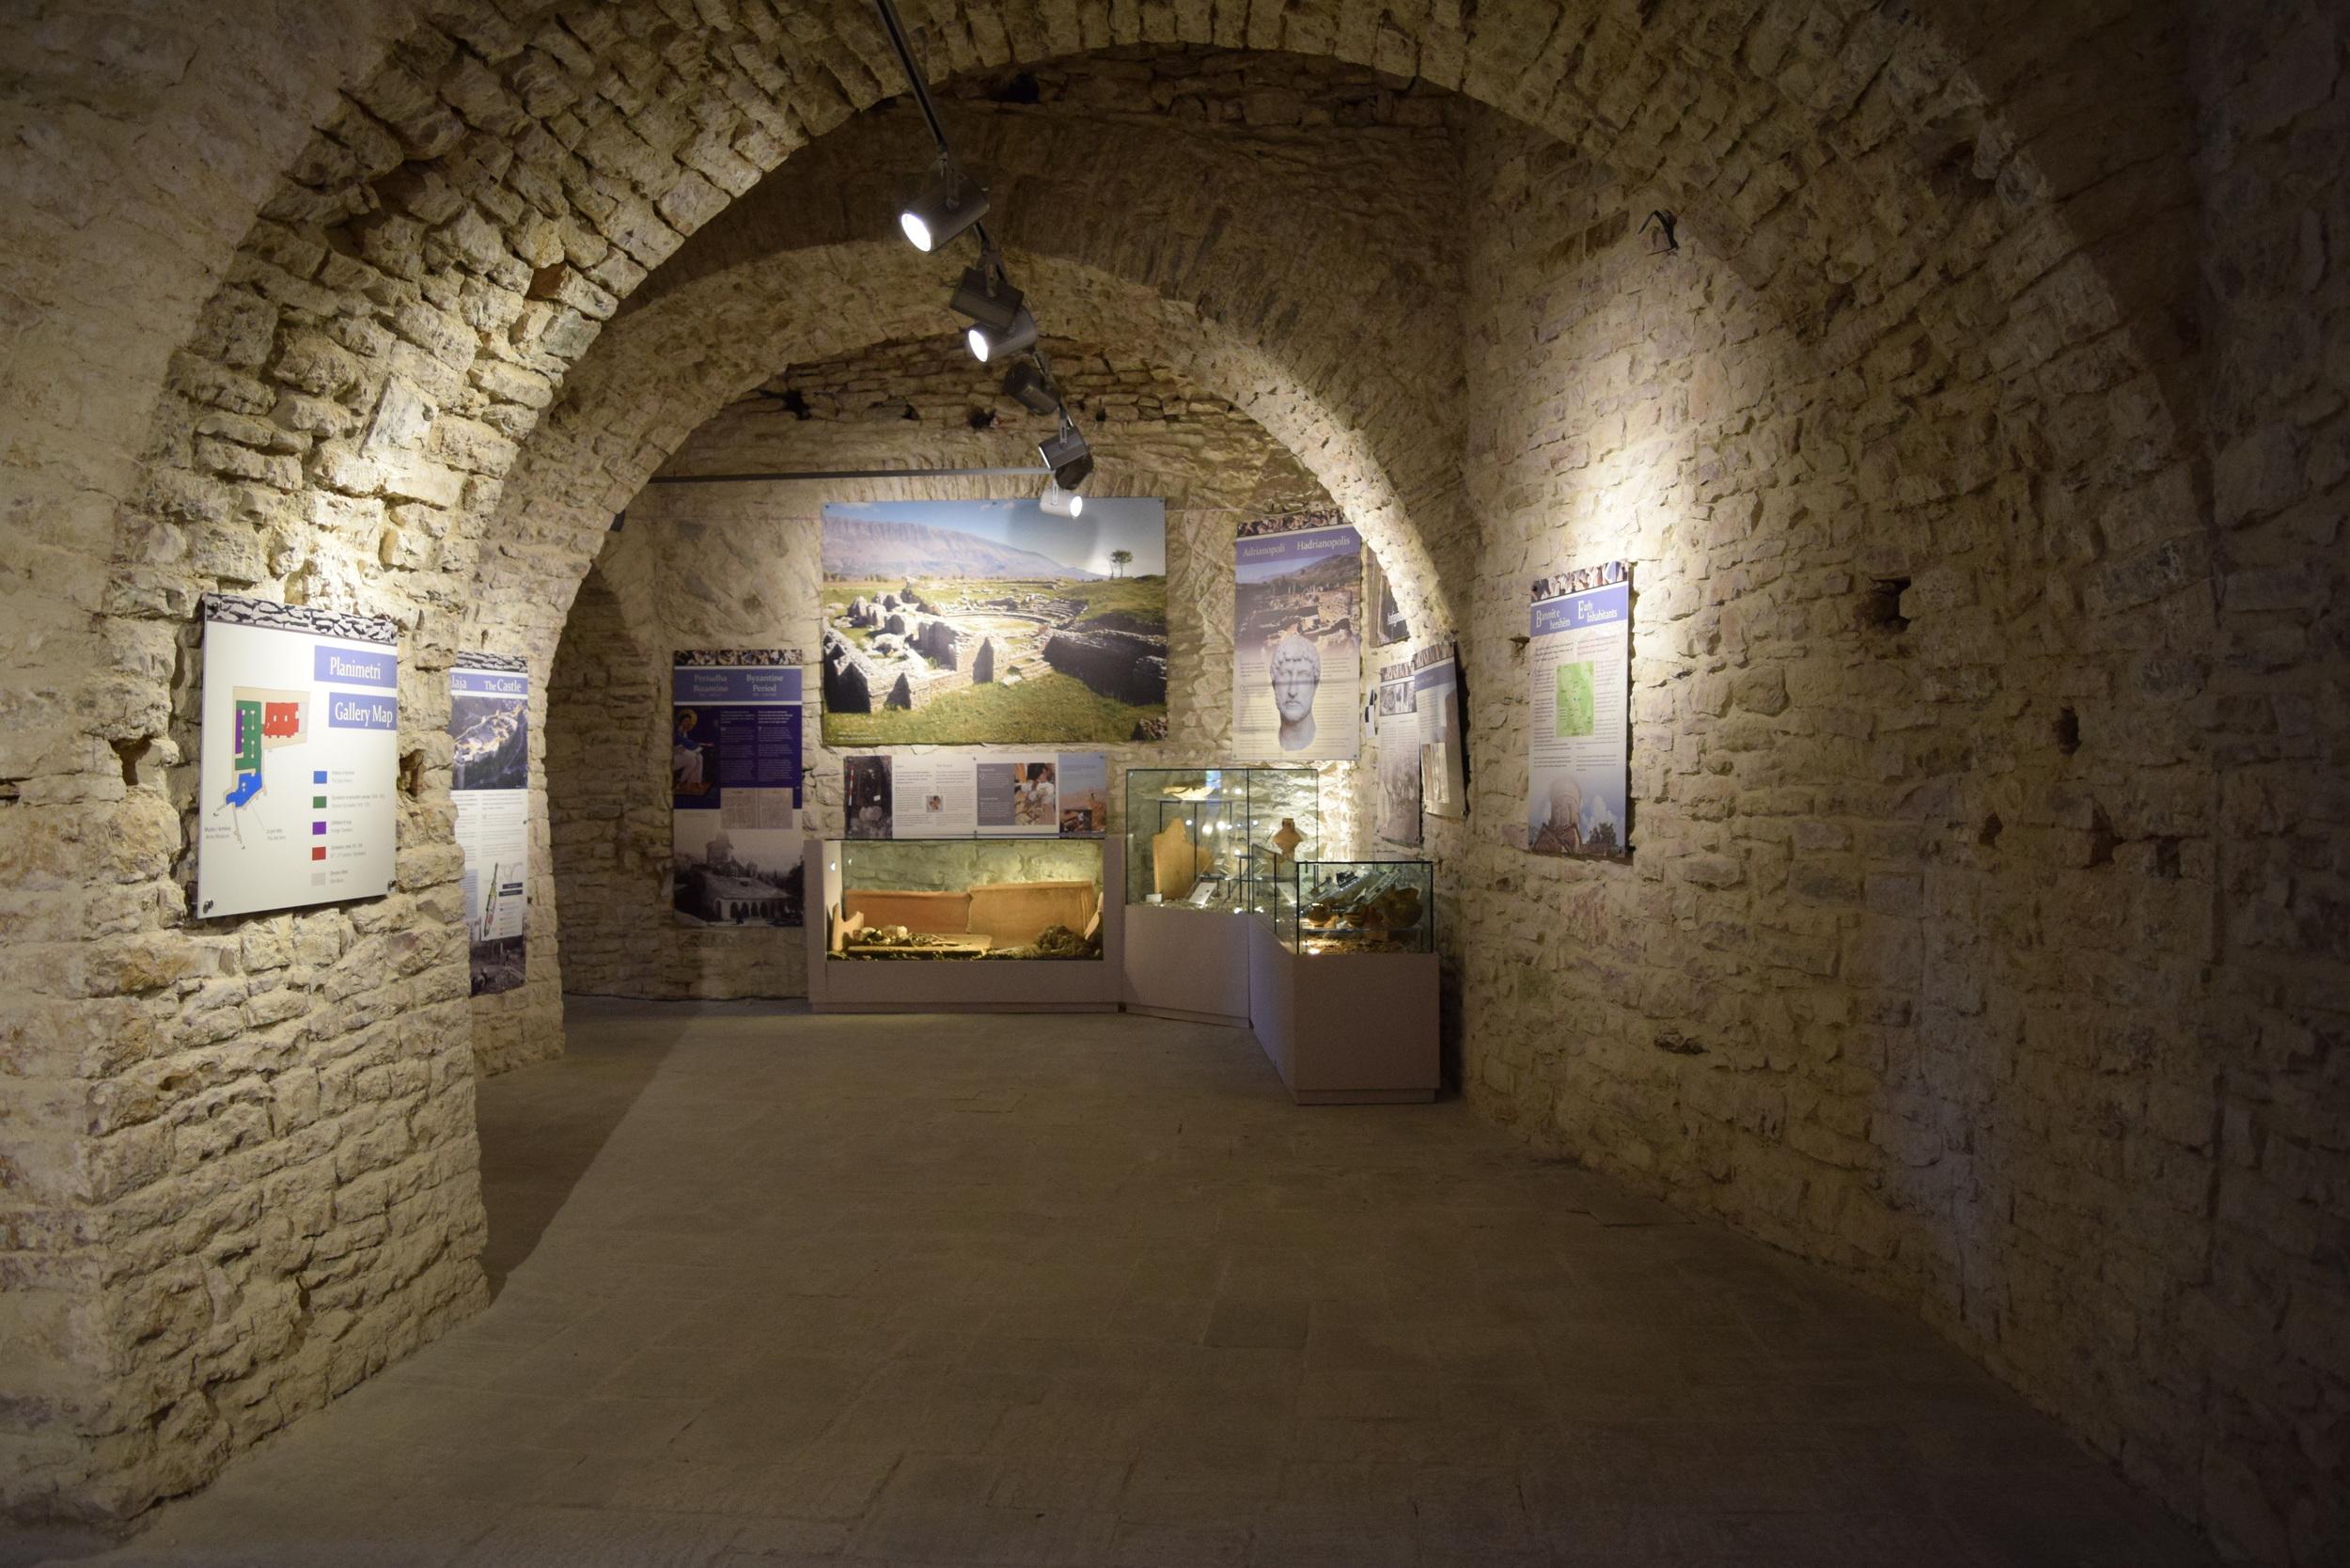 Displays in theMuseum of Gjirokastër